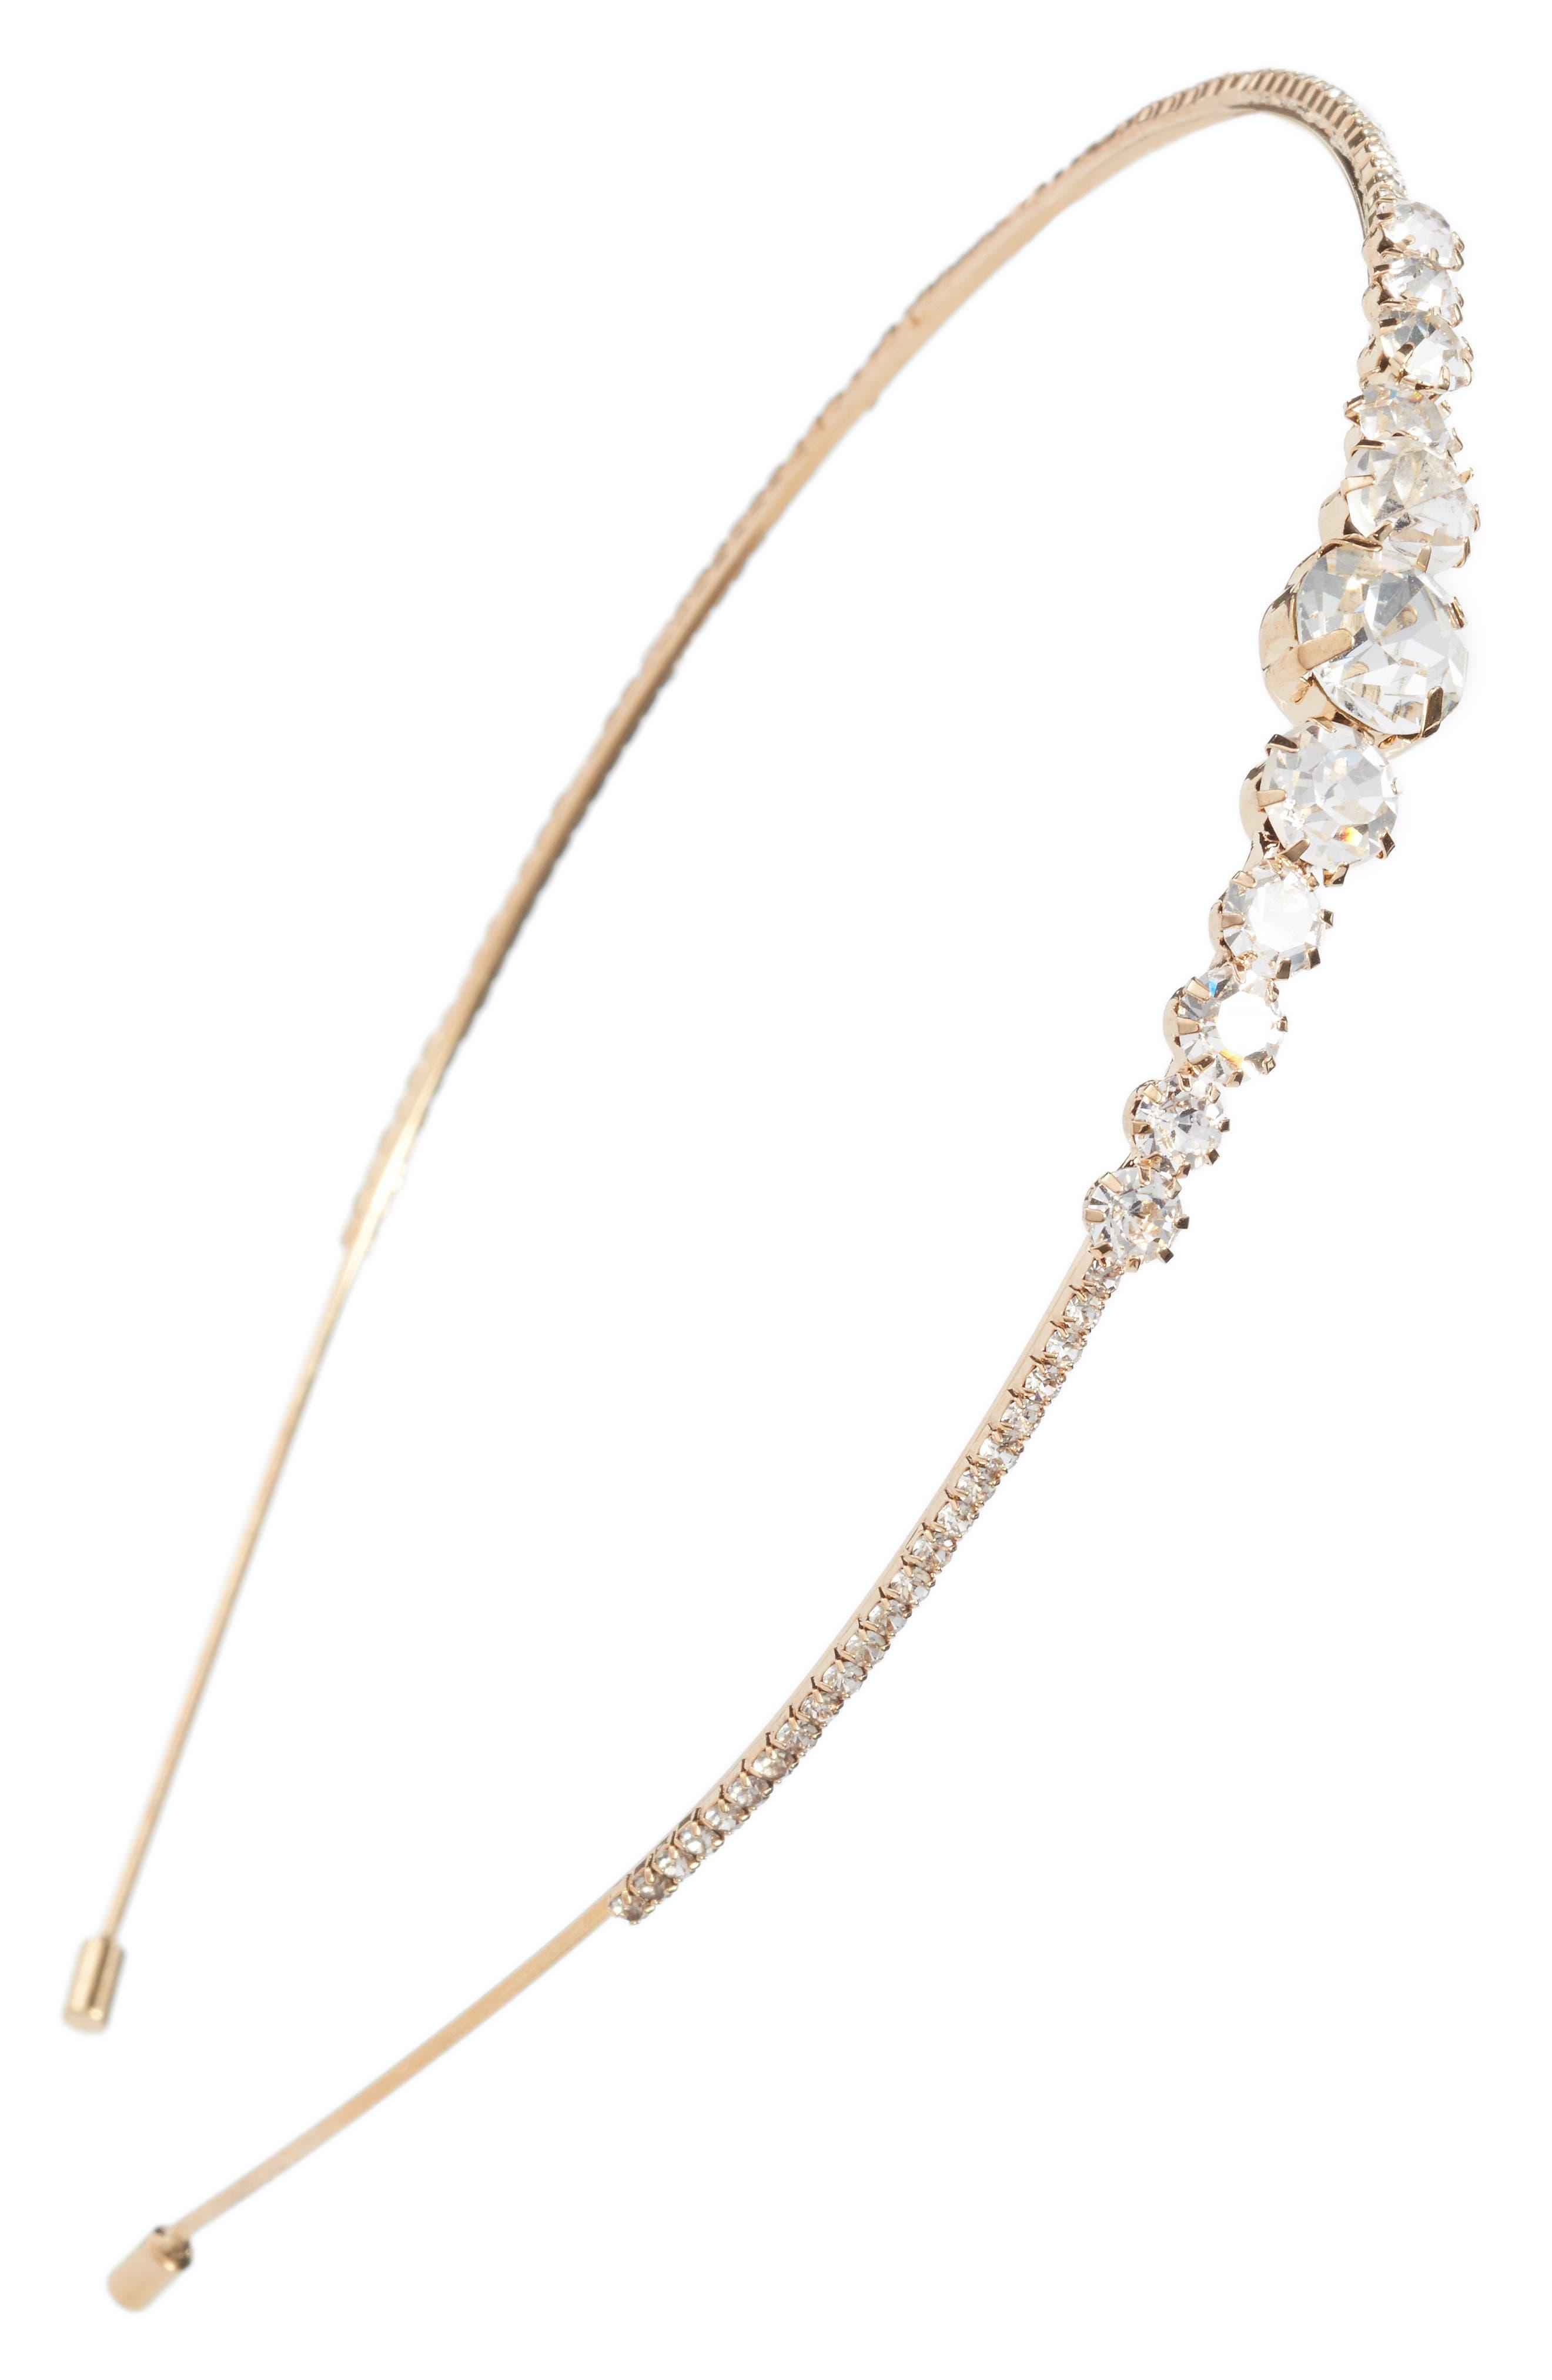 Tasha Crystal Embellished Headband